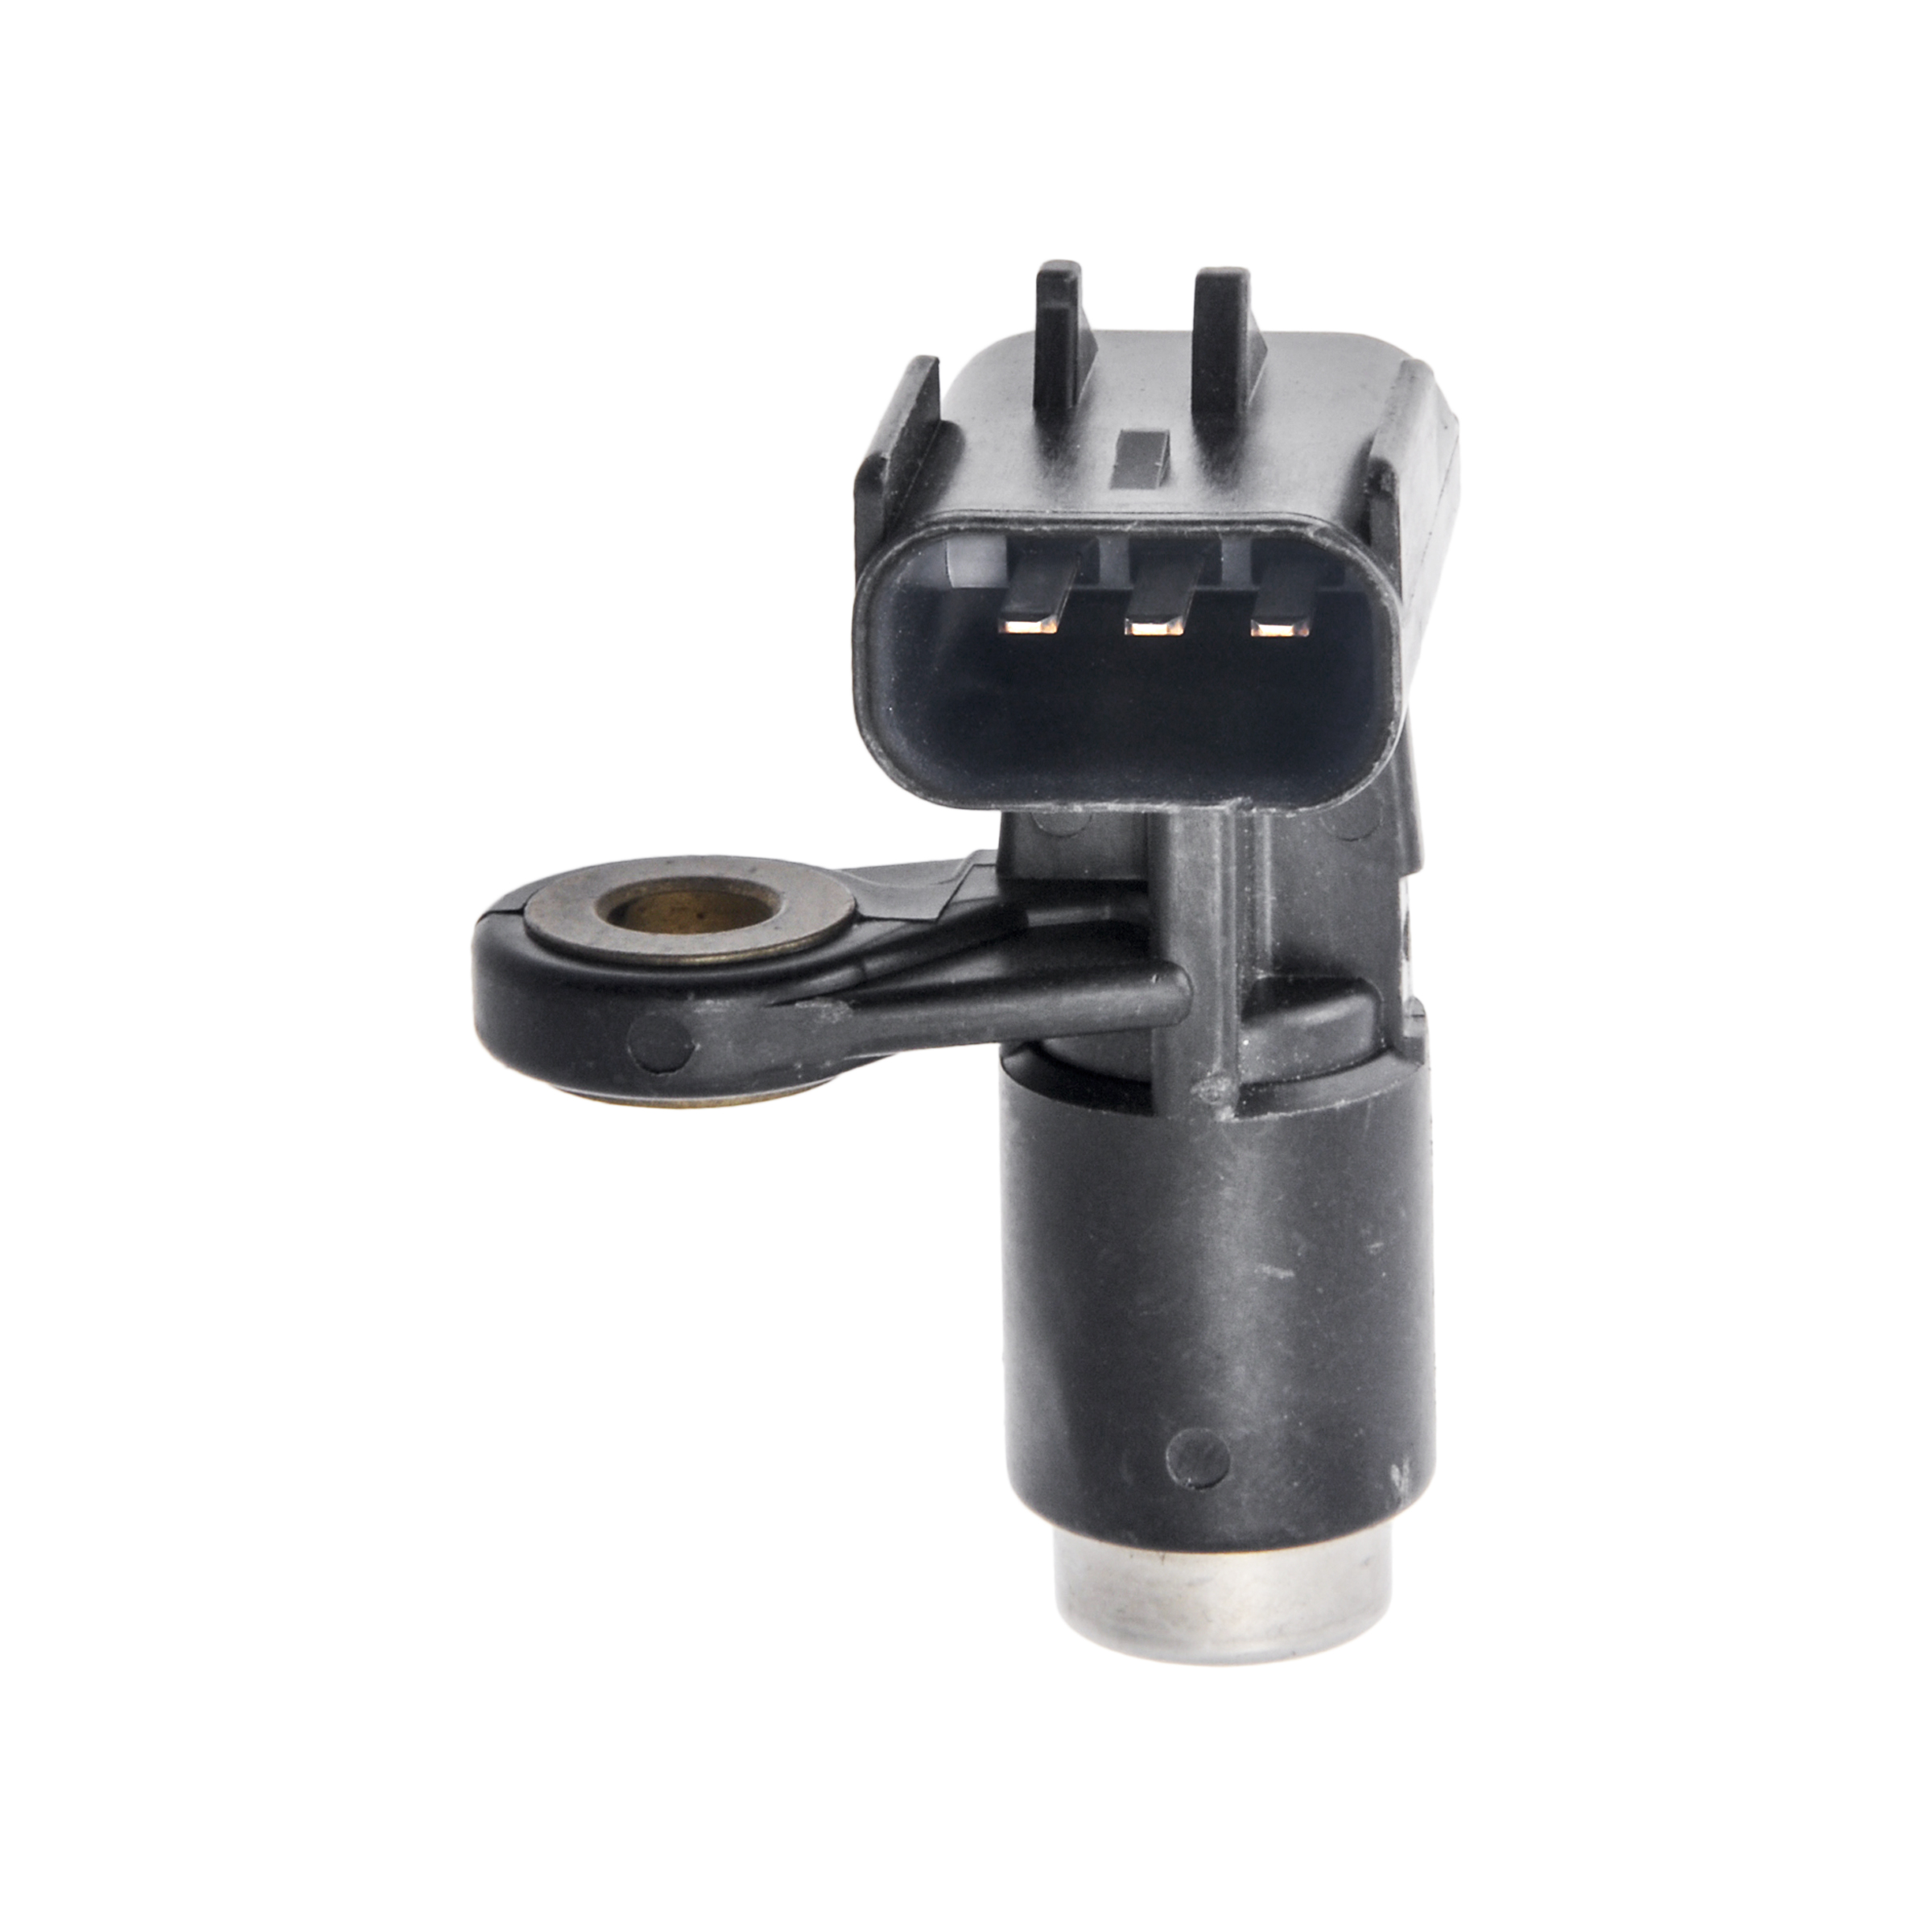 Crankshaft Position Sensor Code Fix: New Herko Crankshaft Position Sensor CKP2027